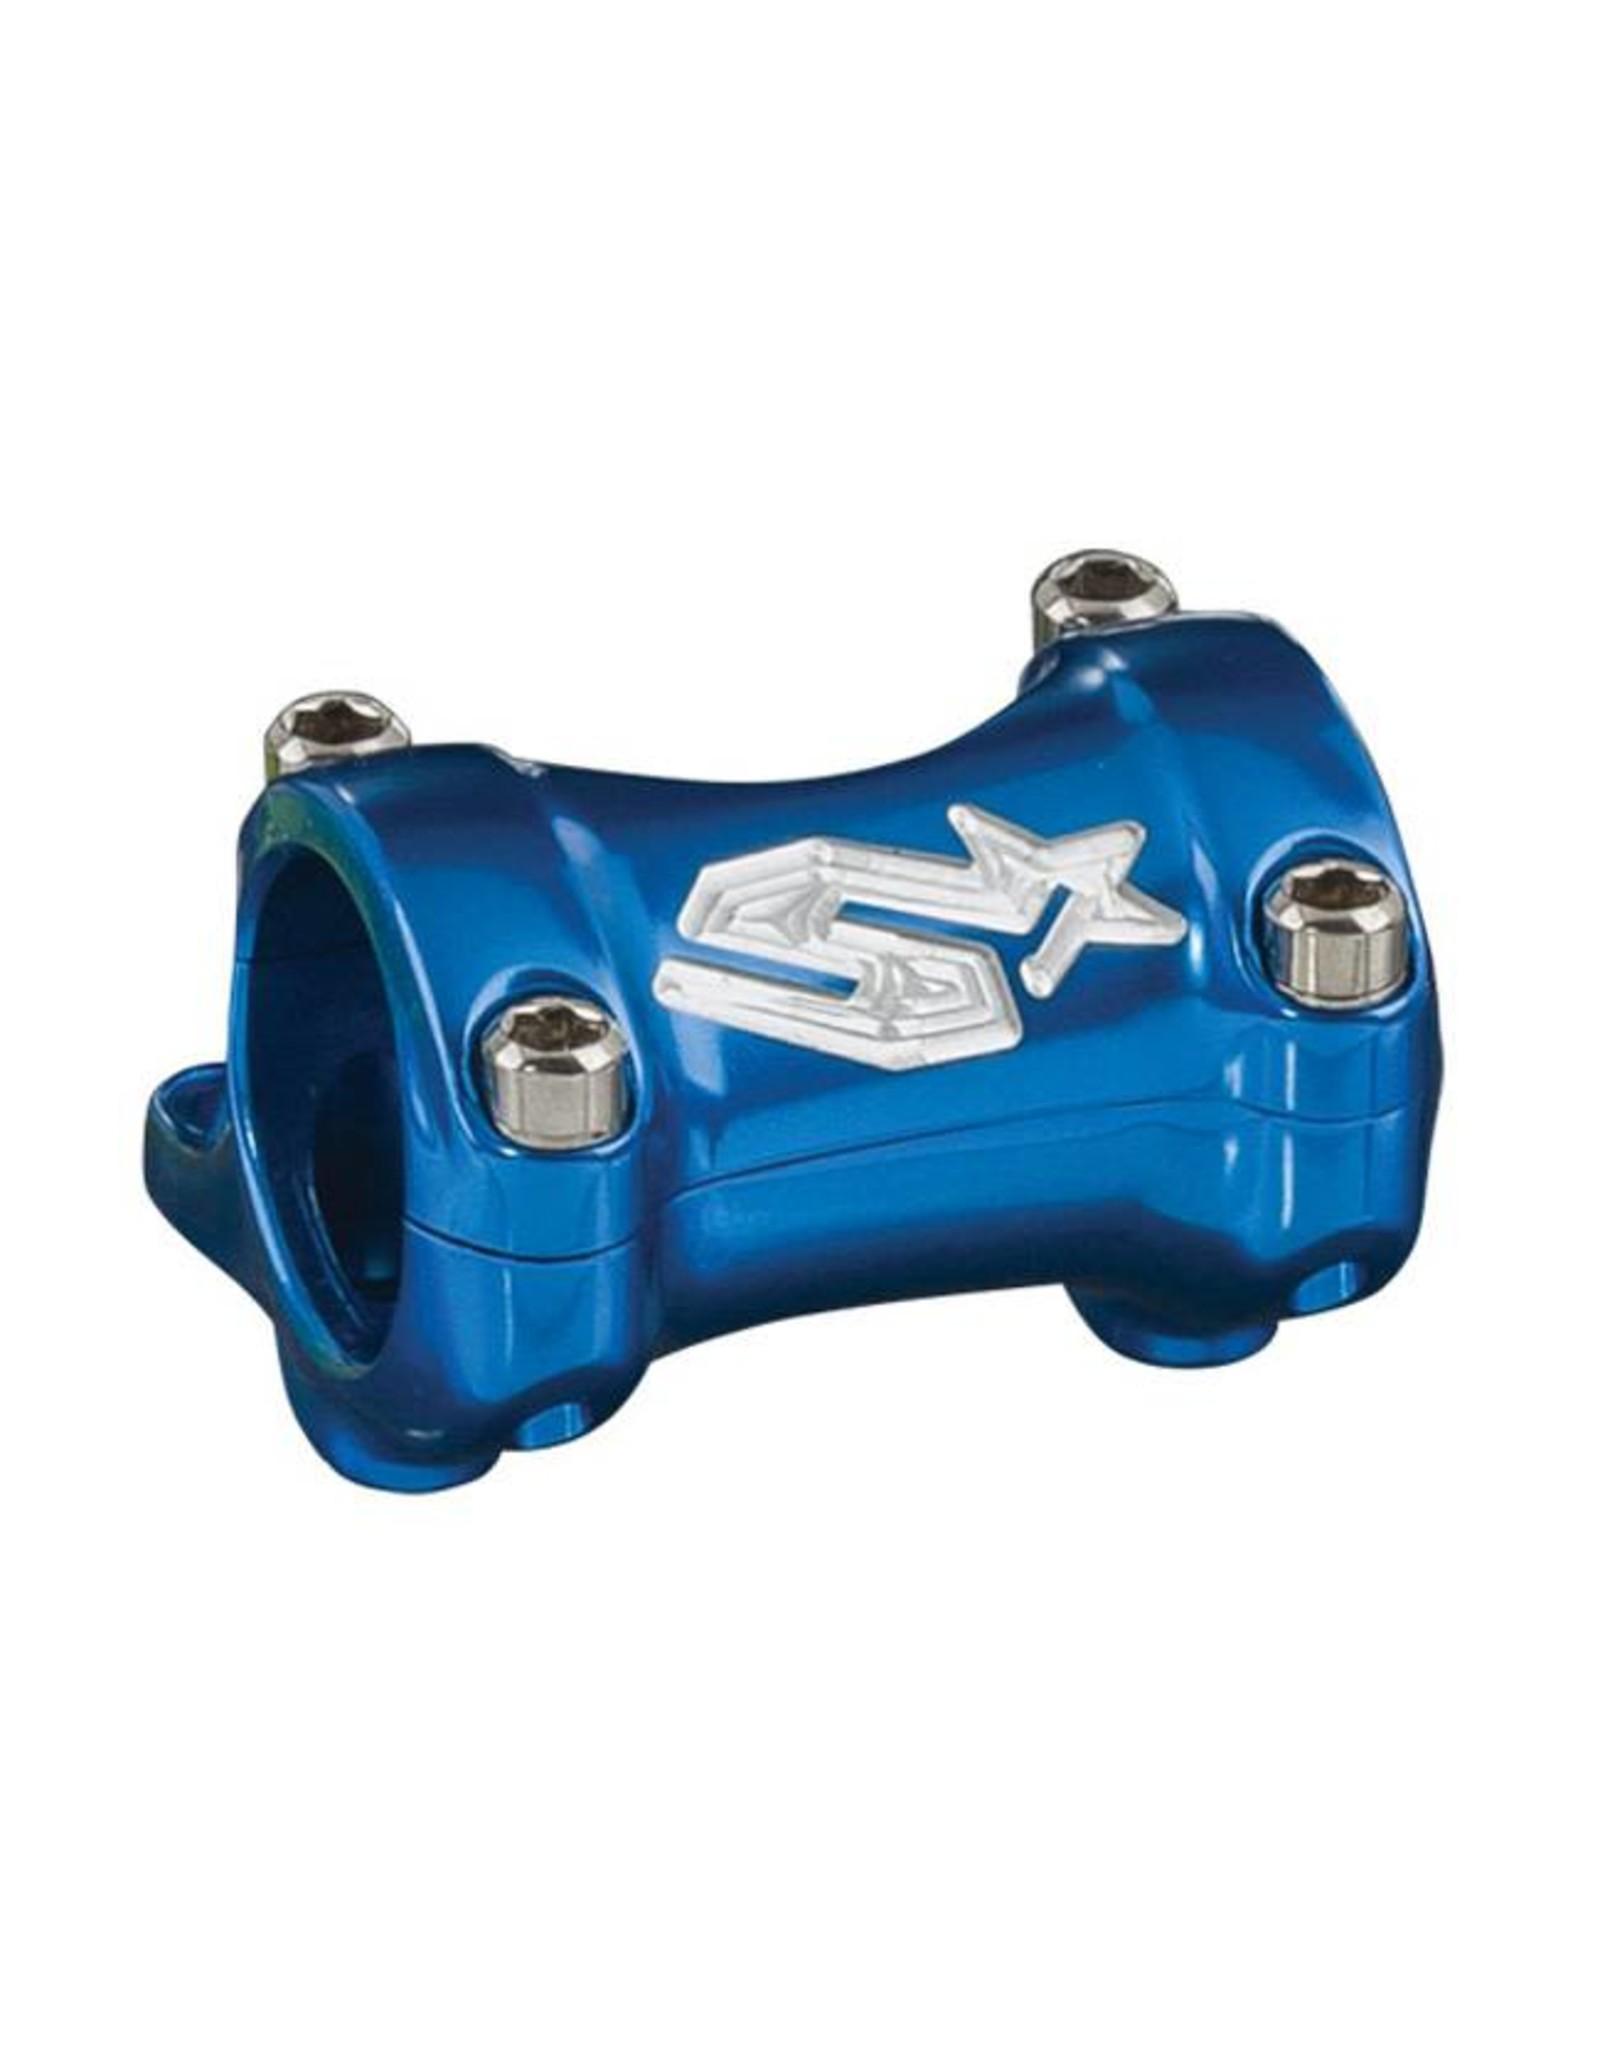 Spank Spank Spike 25/30mm Direct Mount Stem, Blue